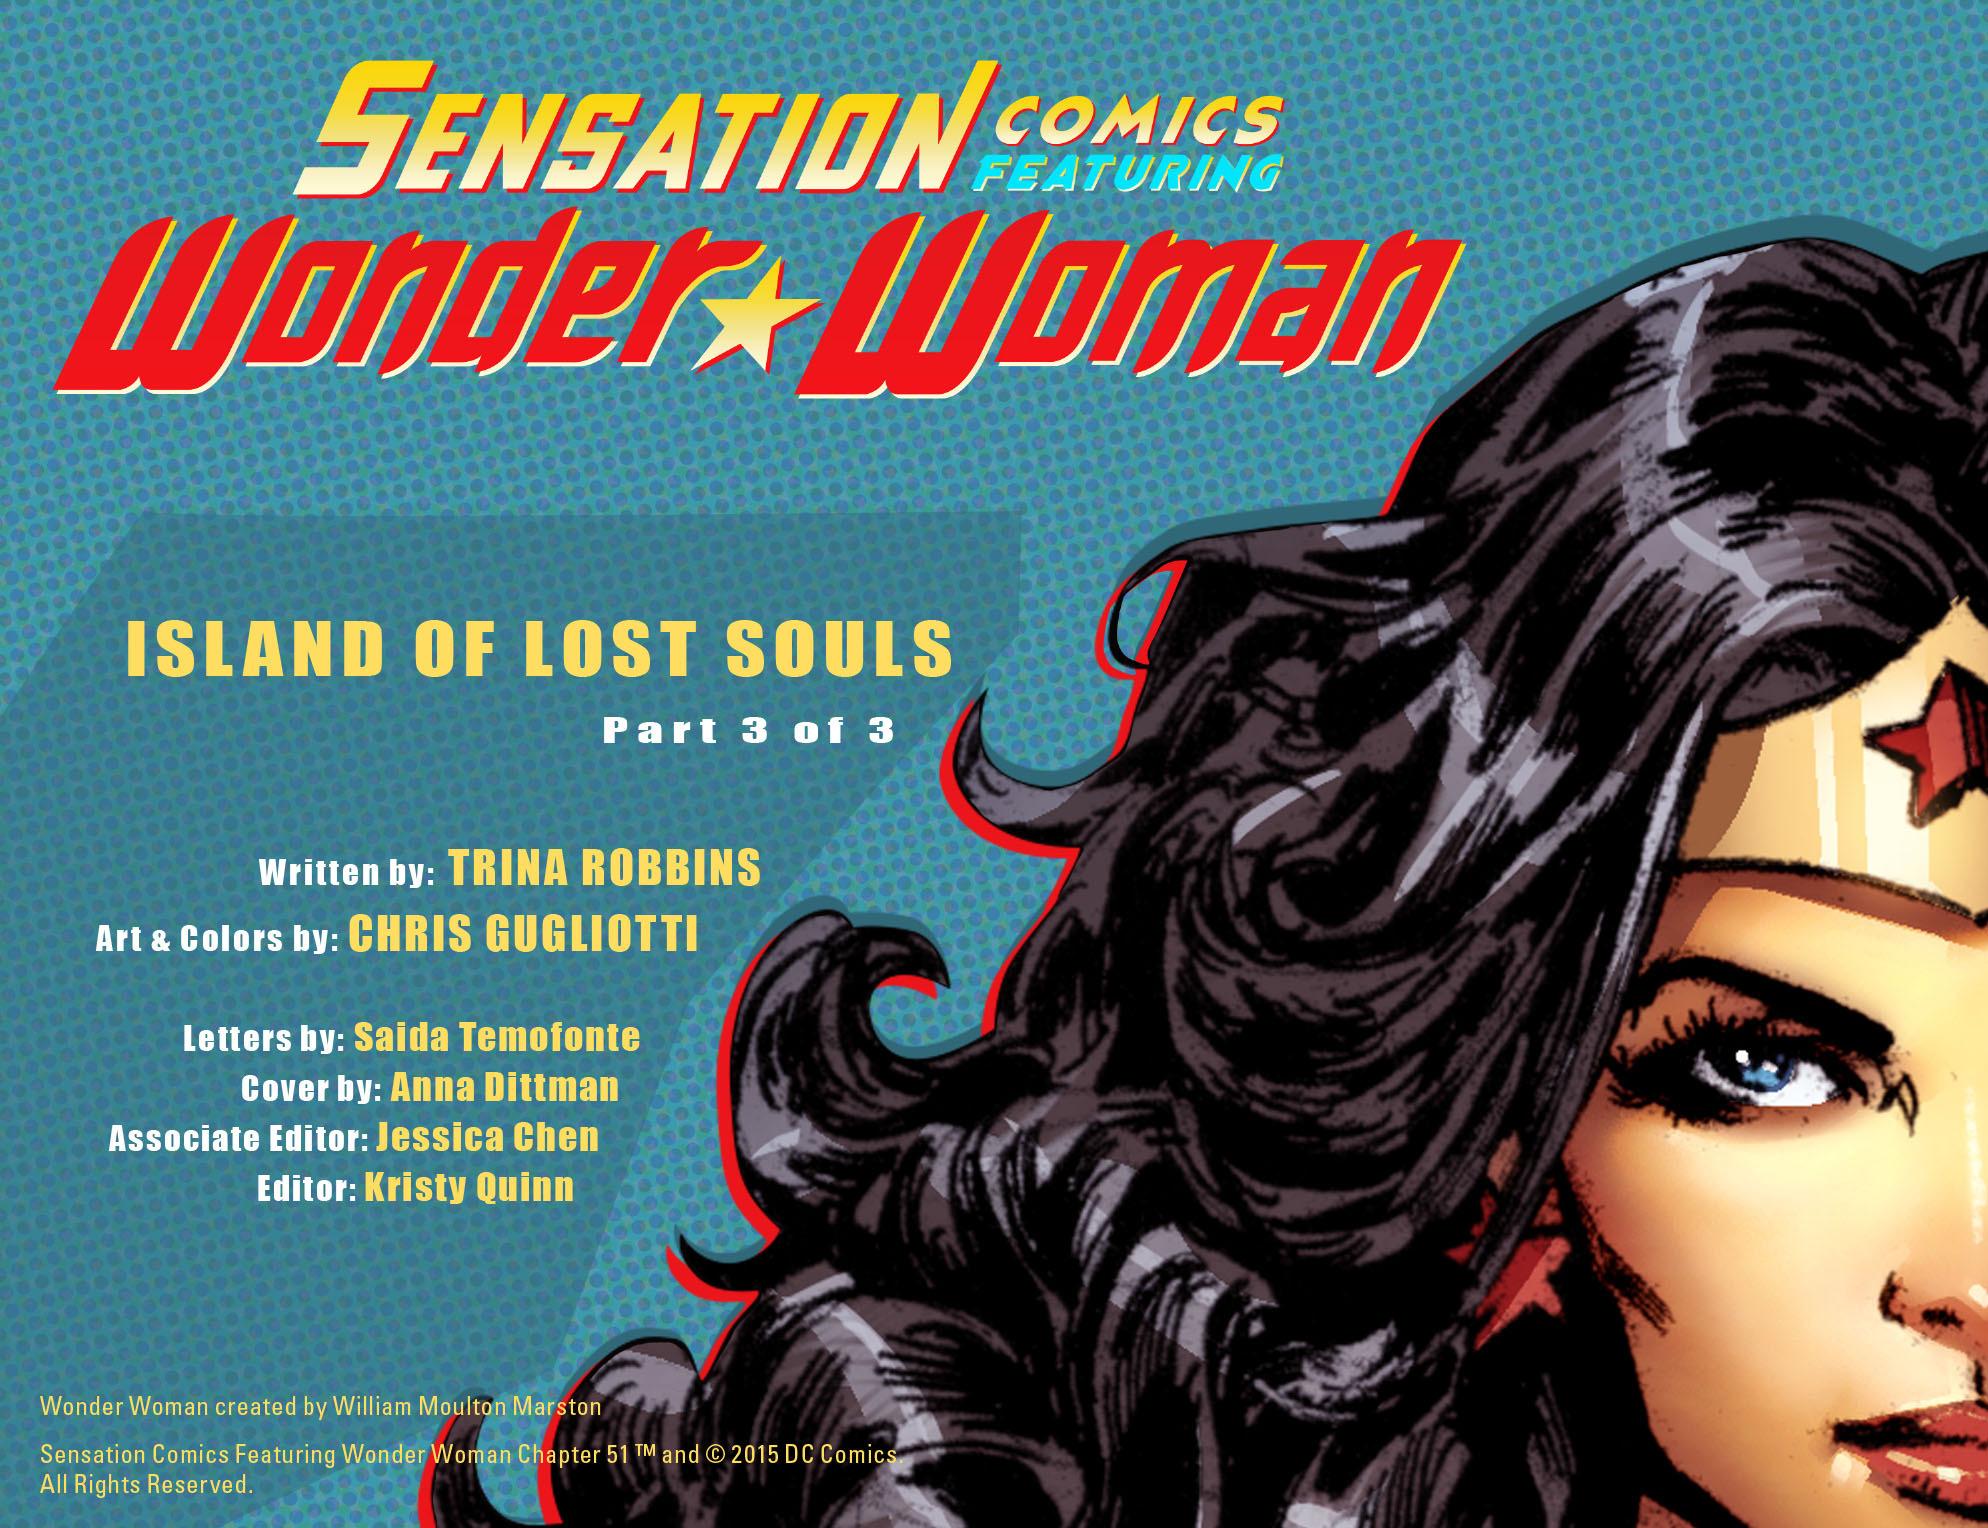 Read online Sensation Comics Featuring Wonder Woman comic -  Issue #51 - 3